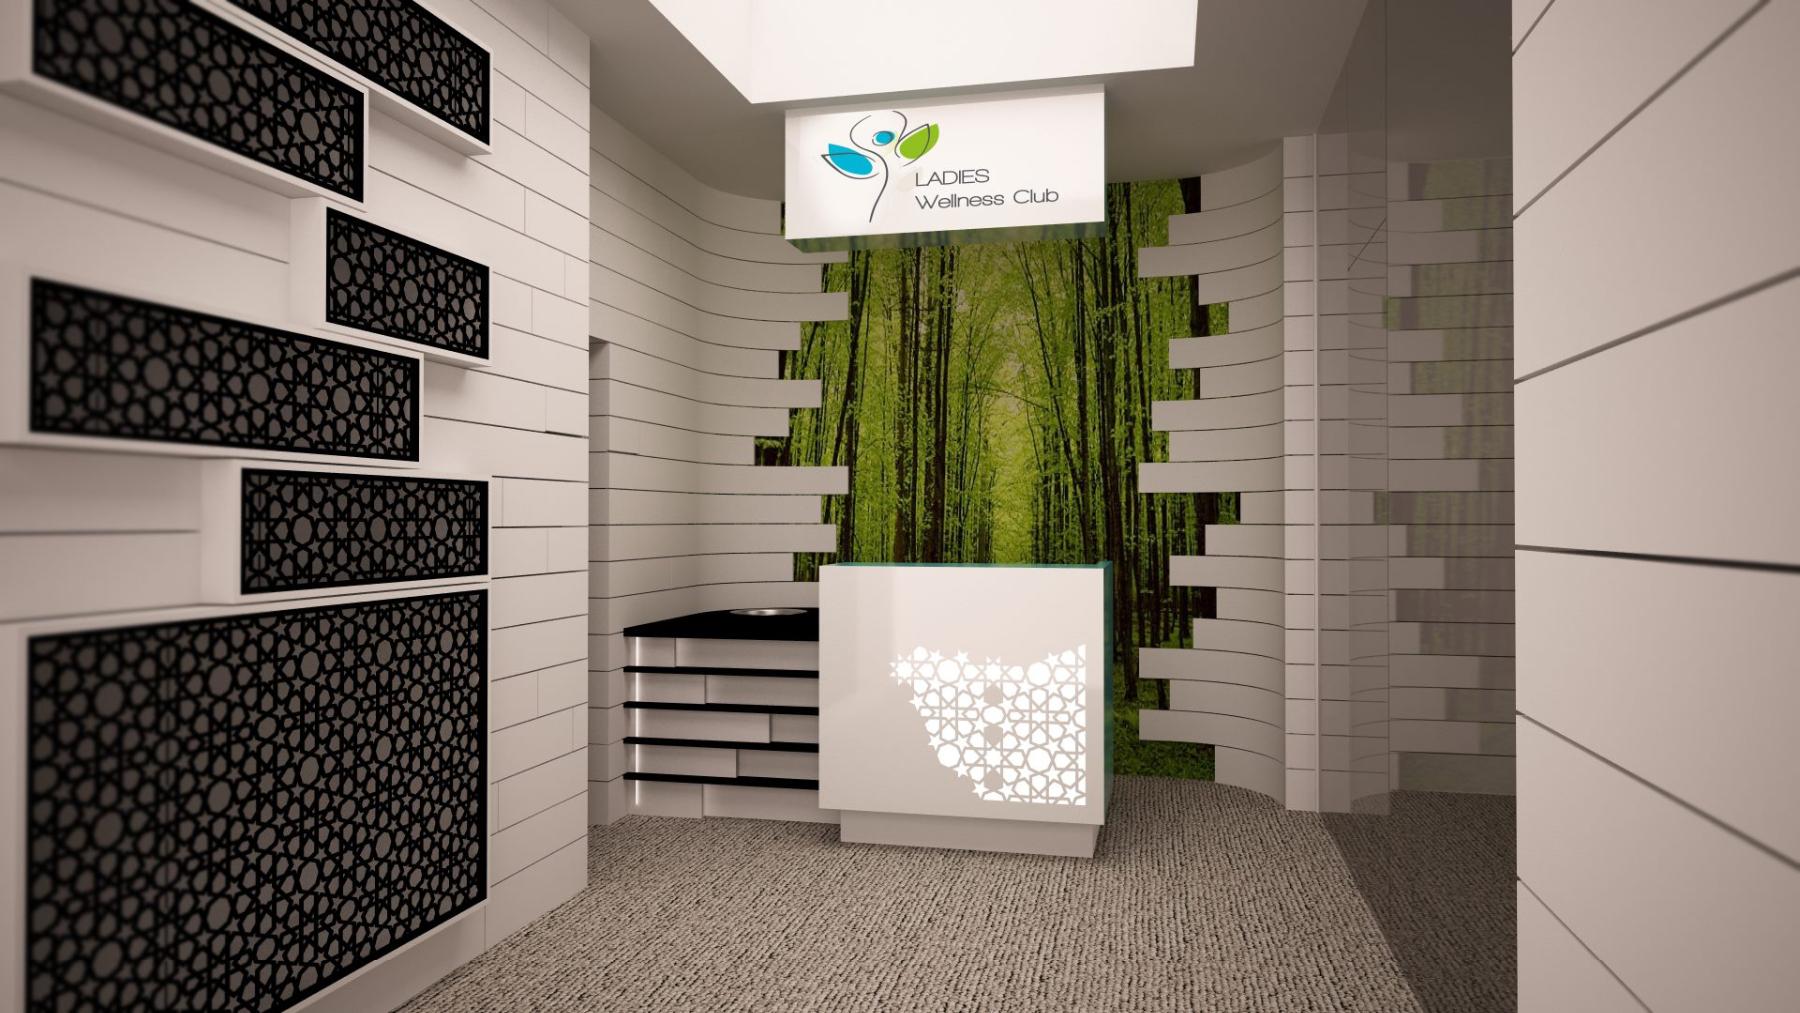 concept amenajare interioara ladys wellness club zona receptie004